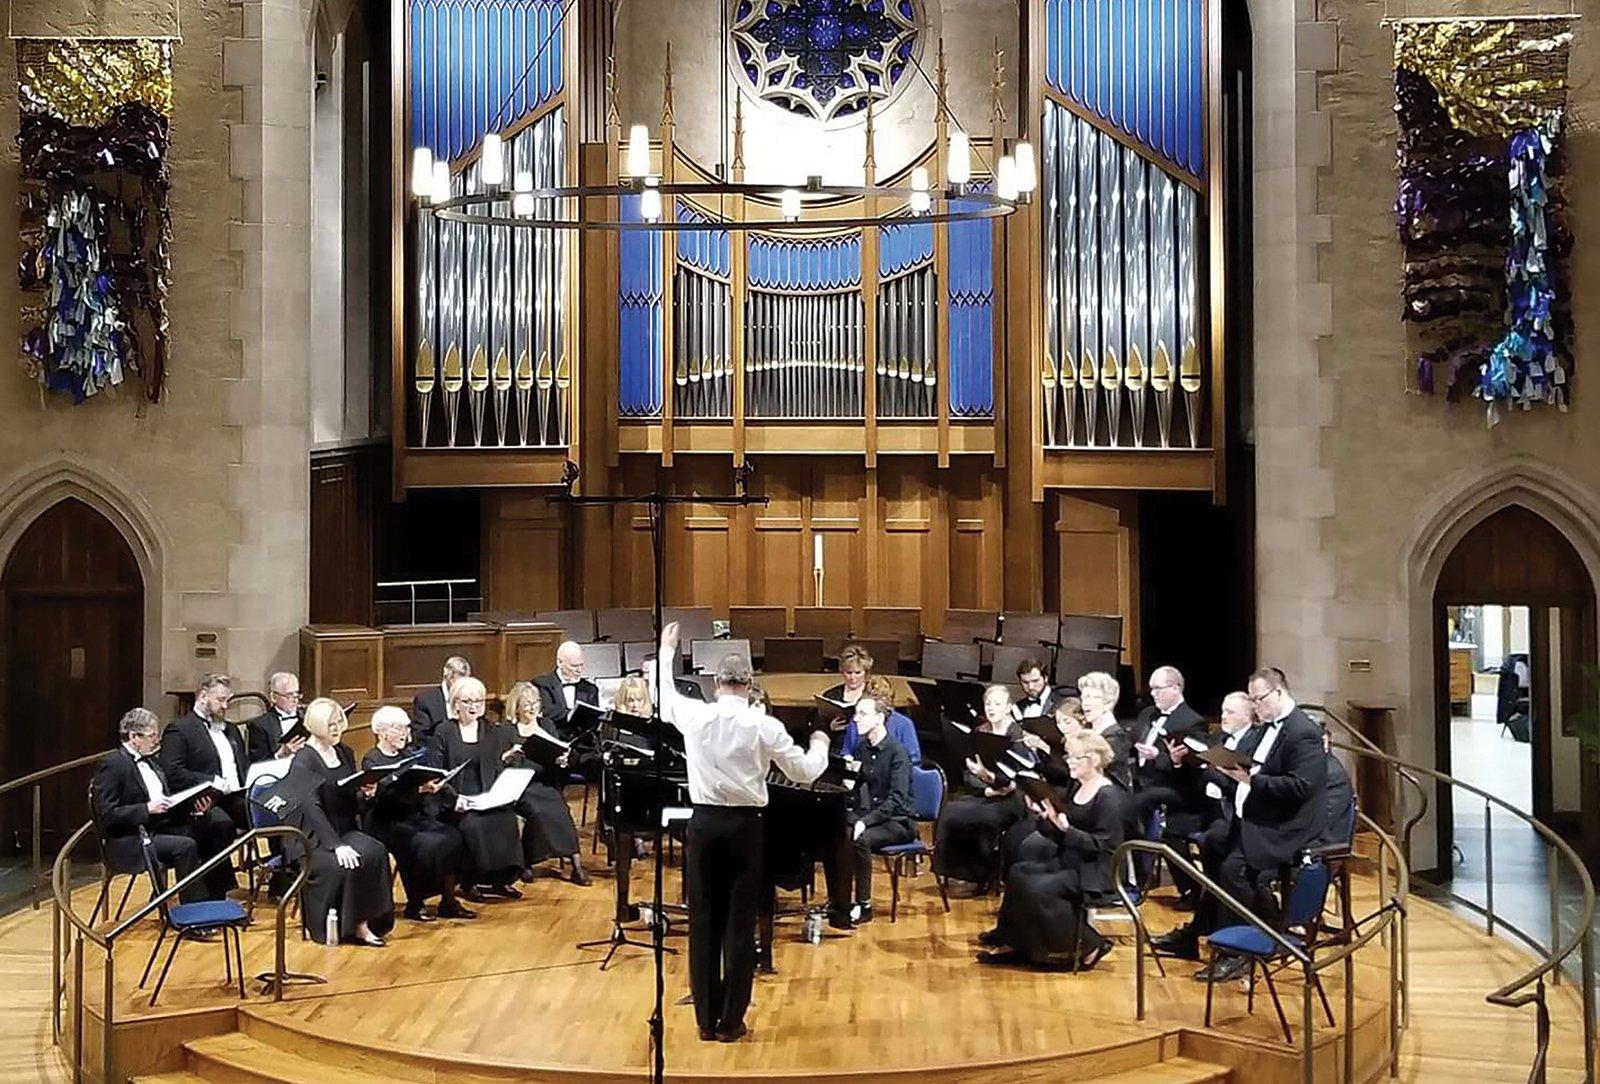 highlands nc concert presbyterian church